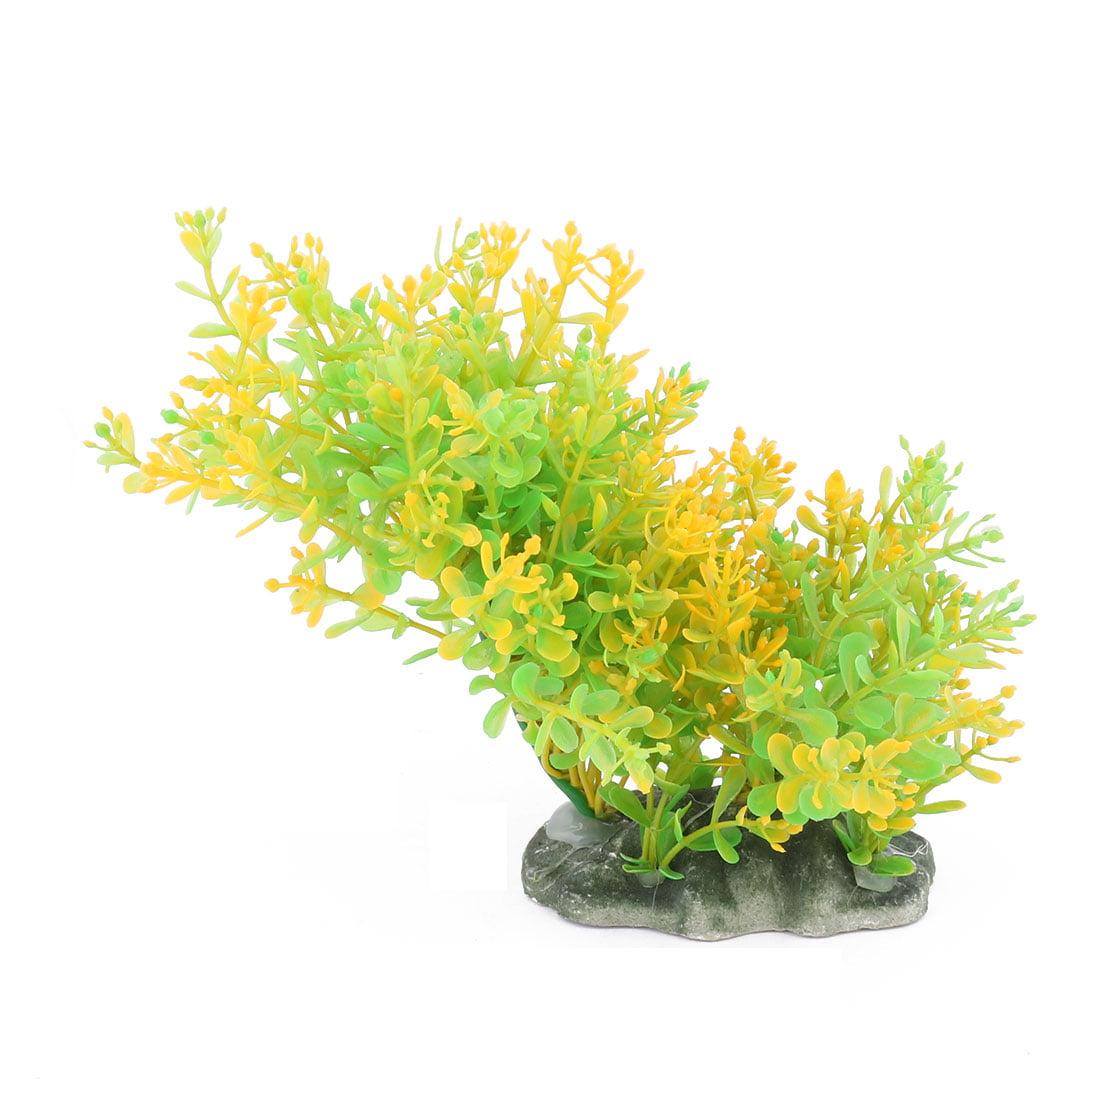 Aquarium Fish Bowl Simulation Landscape Plant Grass Decoration Green Yellow